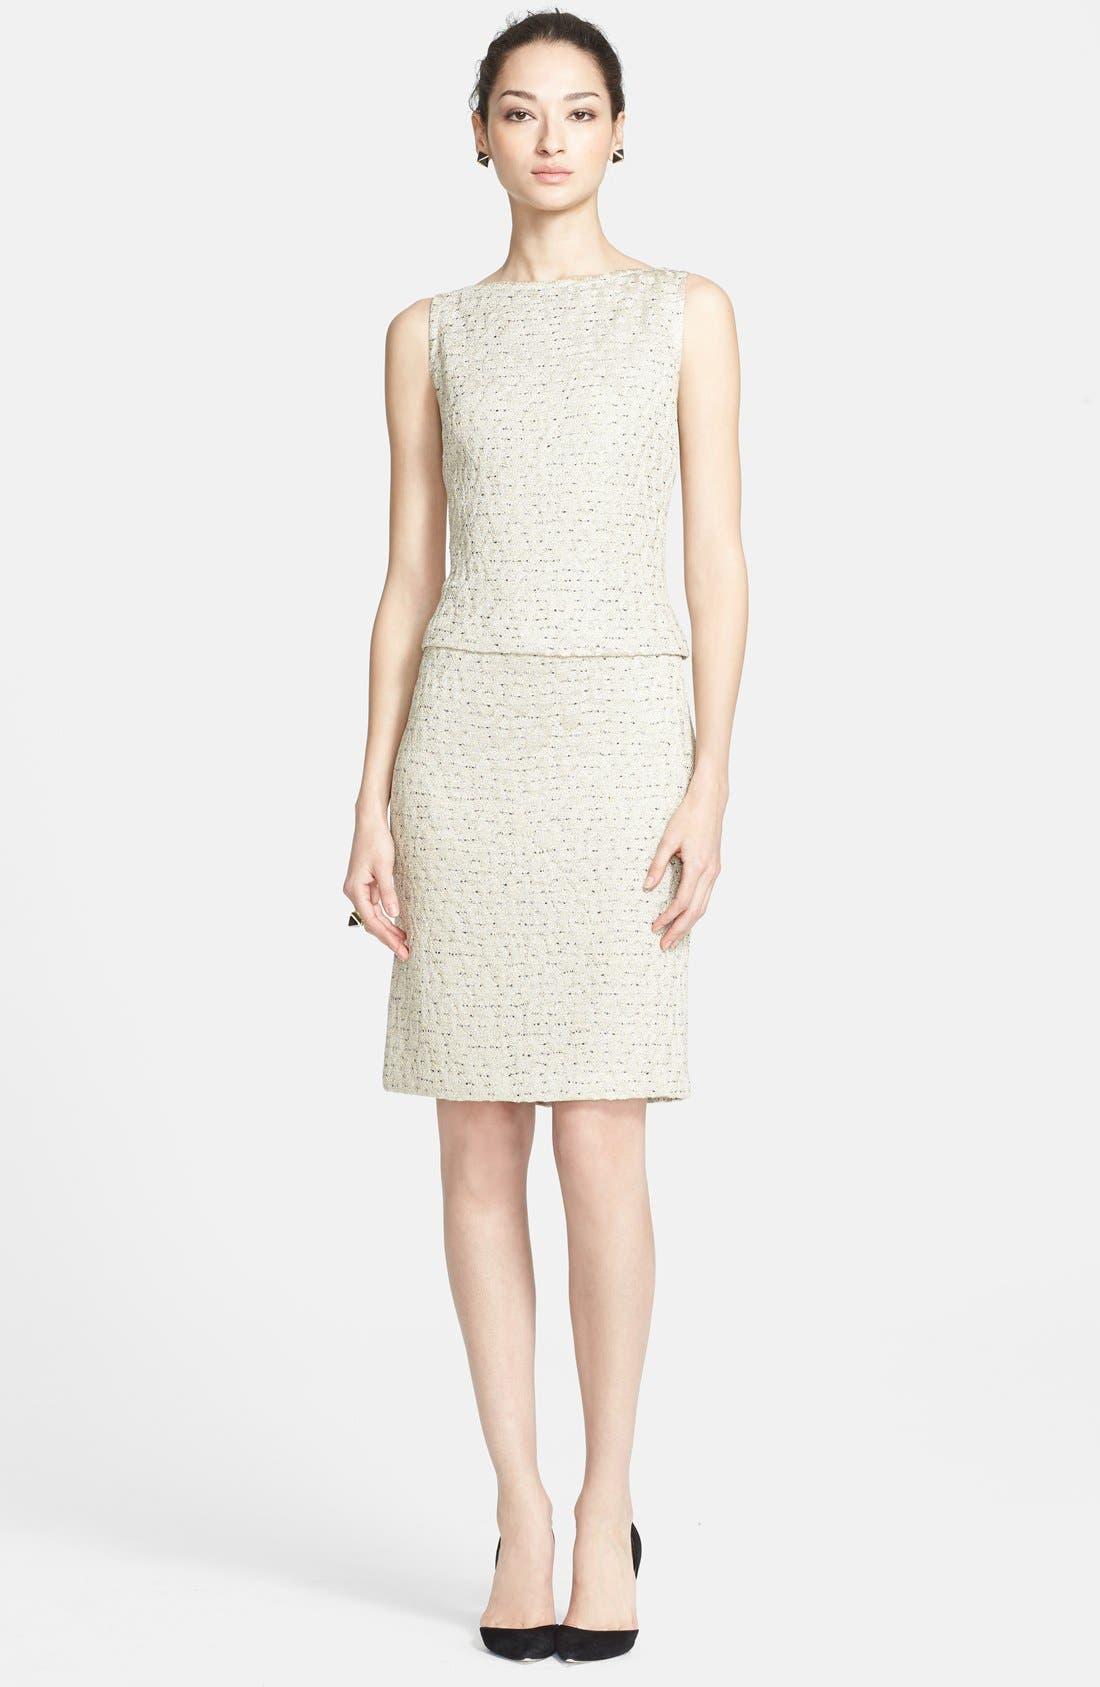 Alternate Image 1 Selected - St. John Collection Leopard Jacquard Knit Mock Two-Piece Dress